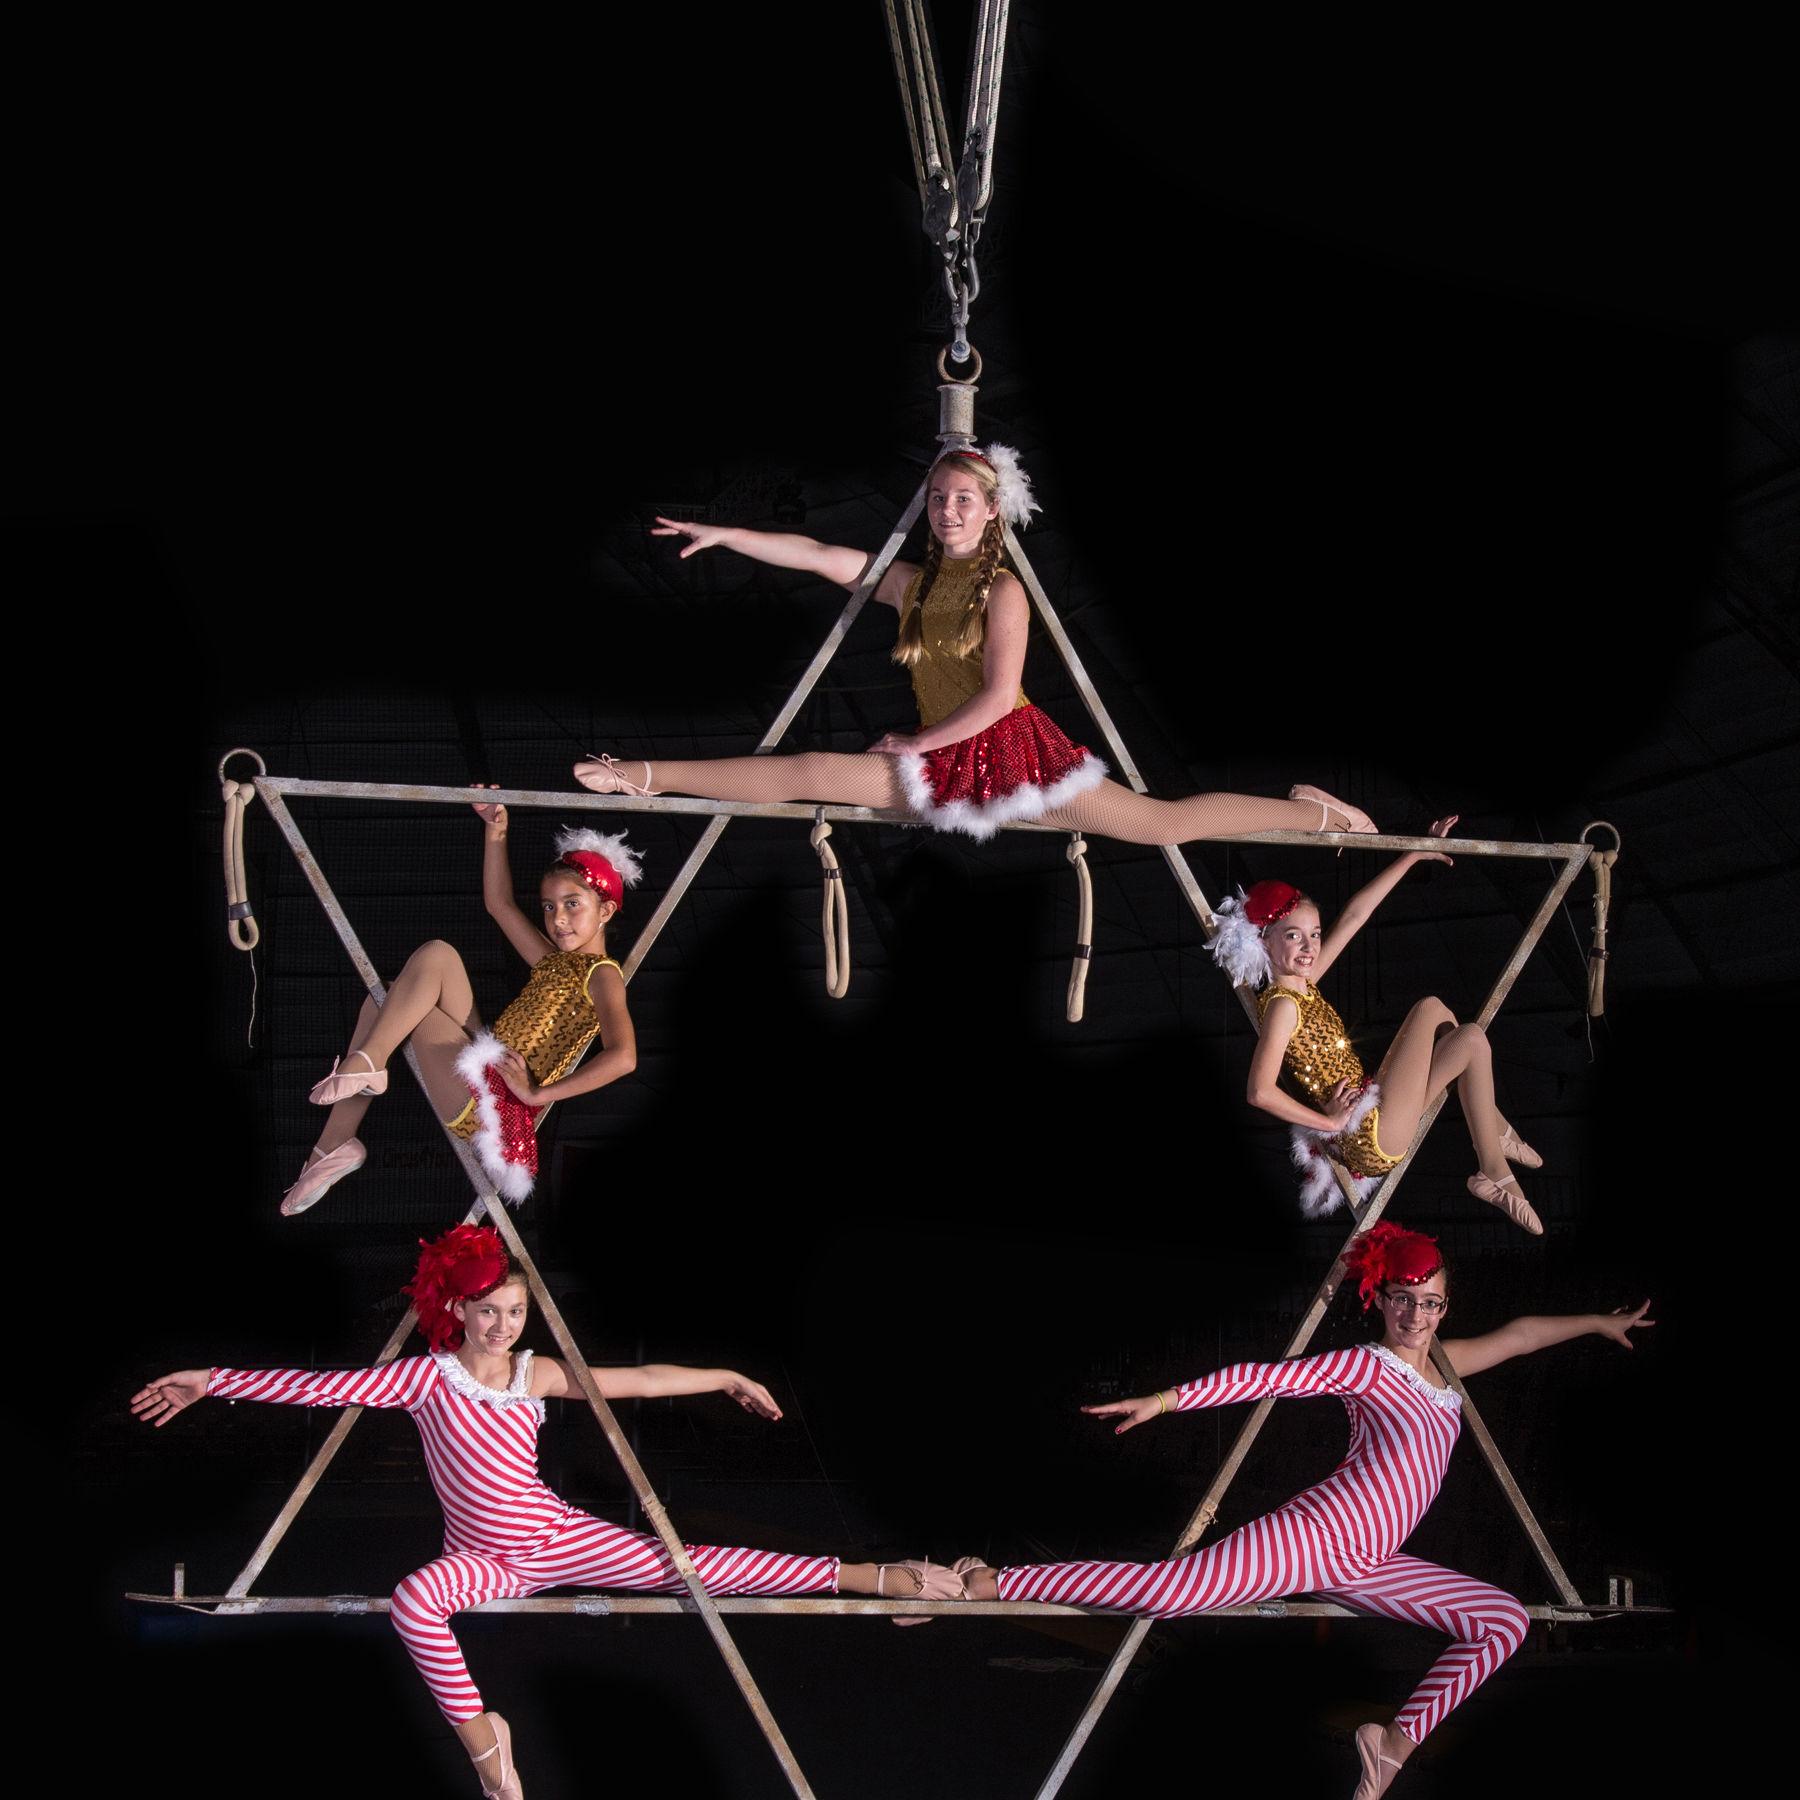 Sailor circus holiday bvfjix